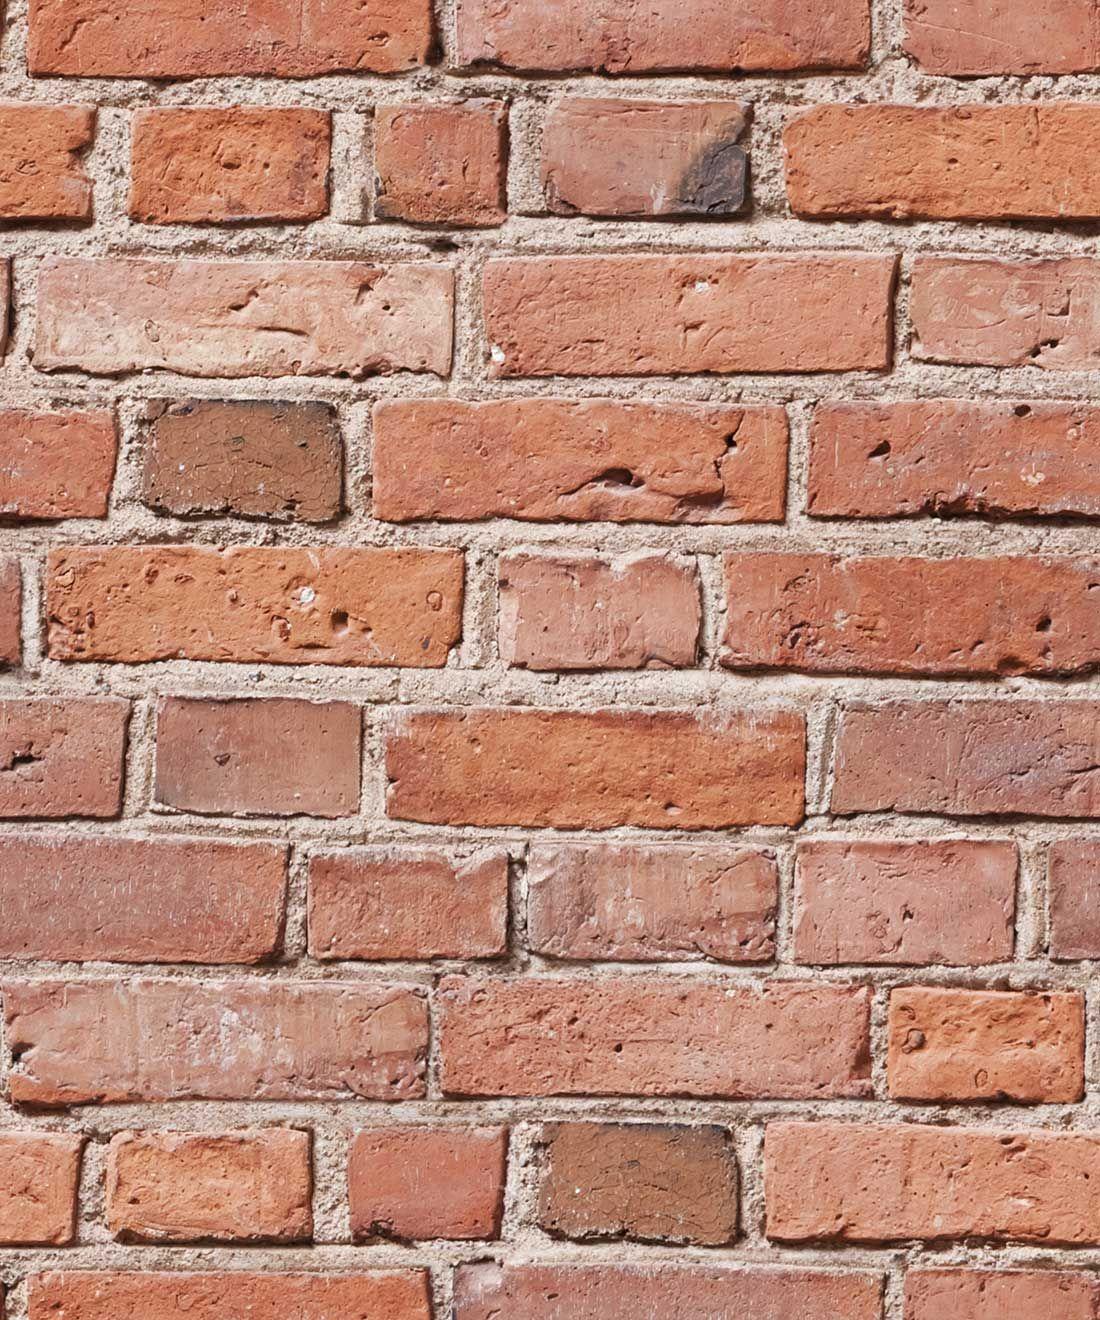 Classic Red Bricks Wallpaper Industrial Allure Of Brick Milton King In 2021 Brick Wallpaper Red Brick Wallpaper White Brick Wallpaper